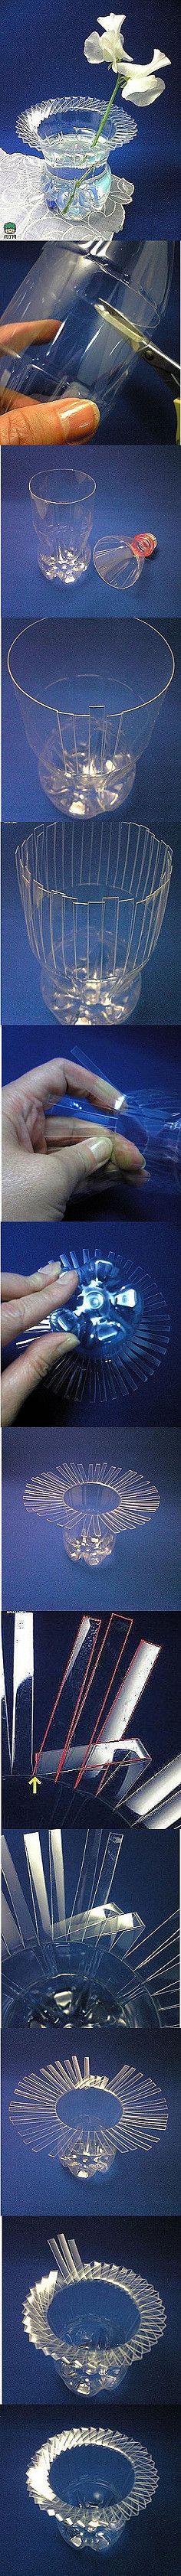 Transformation of mineral water bottle vase